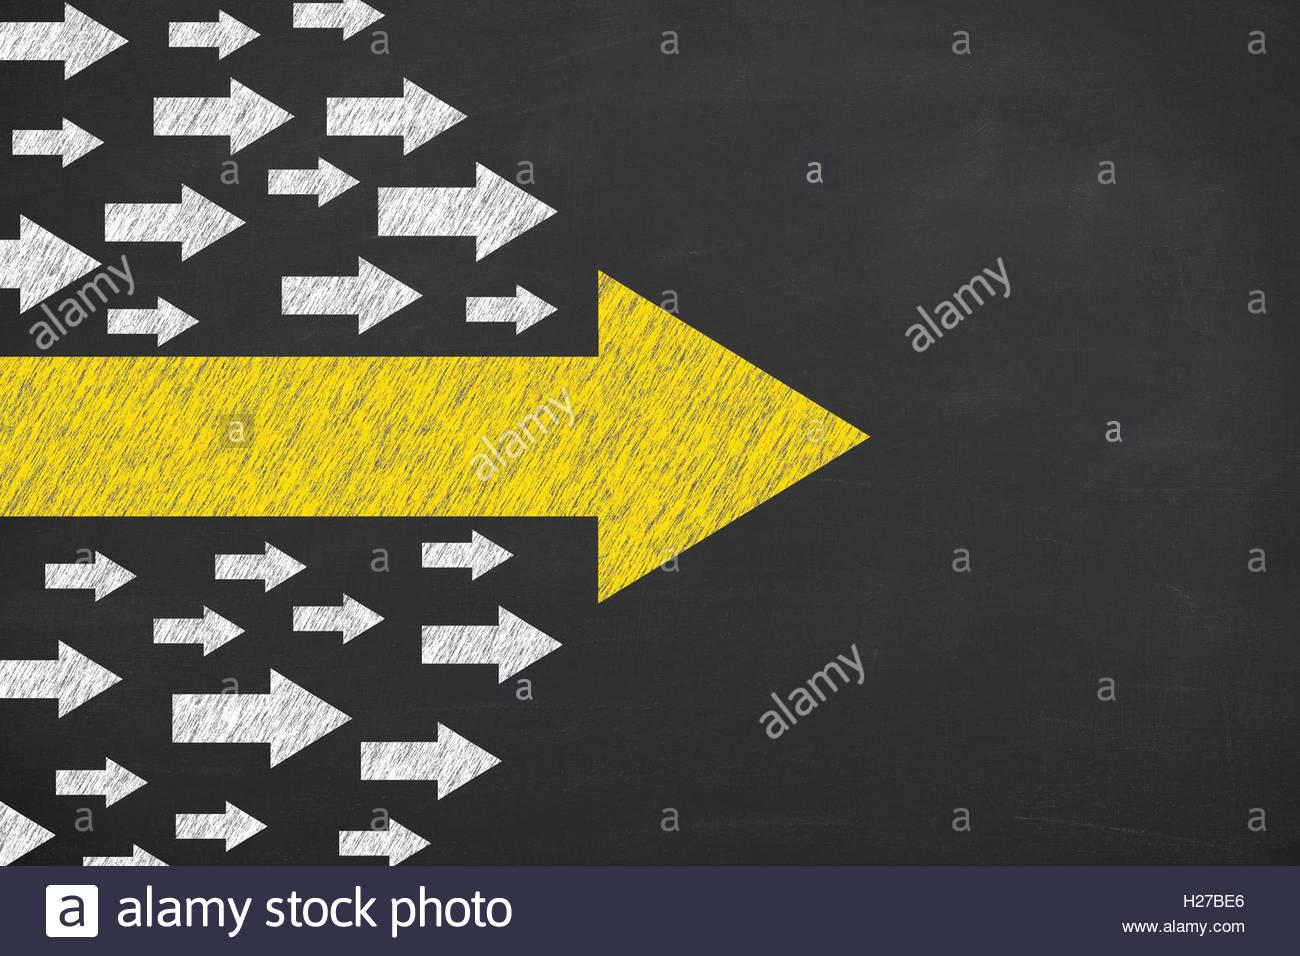 Arrows Leadership Concept on Blackboard Background - Stock Image